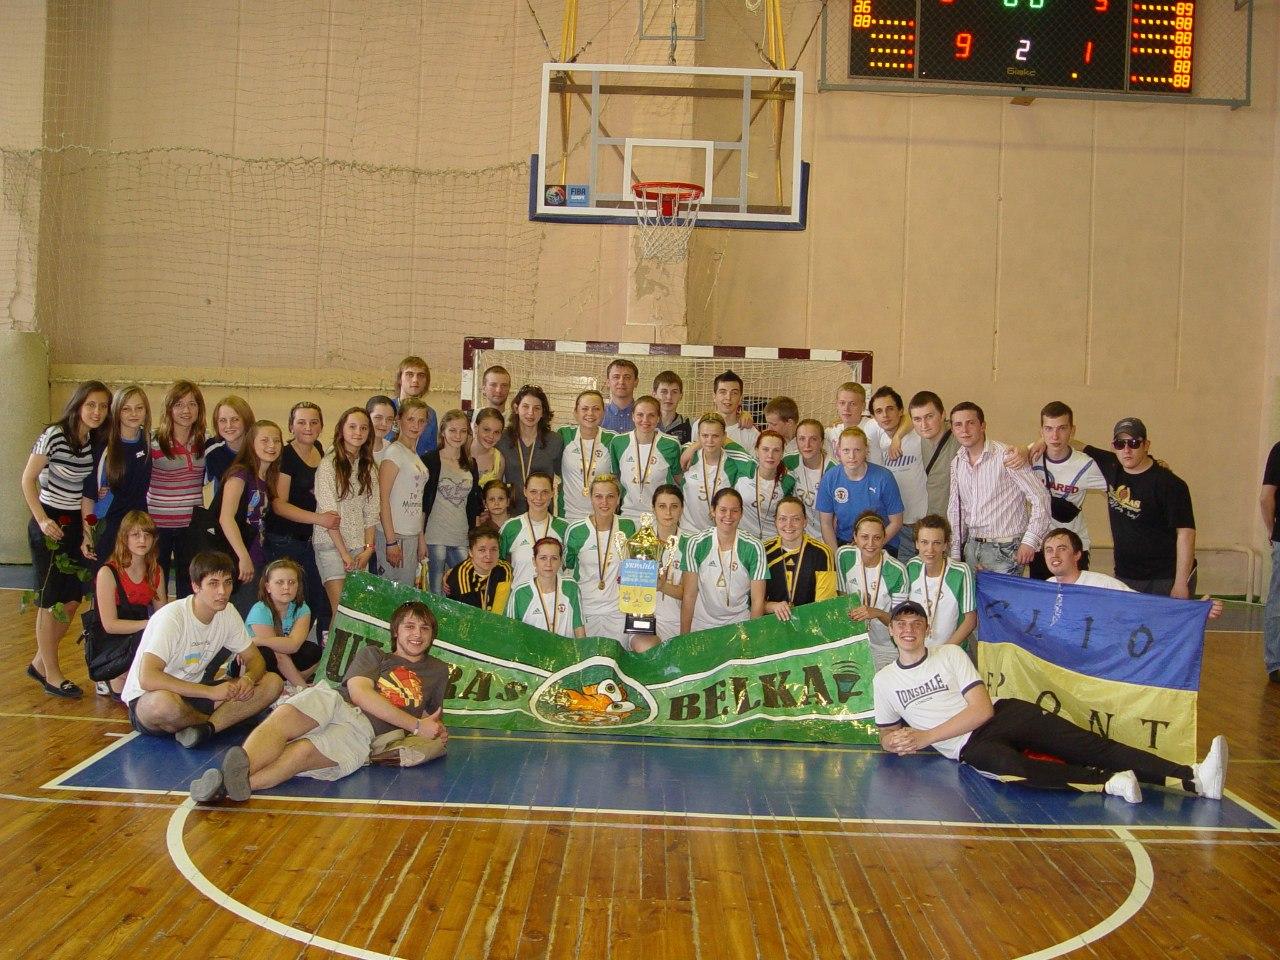 Беличанка, КУбок Украины 2012